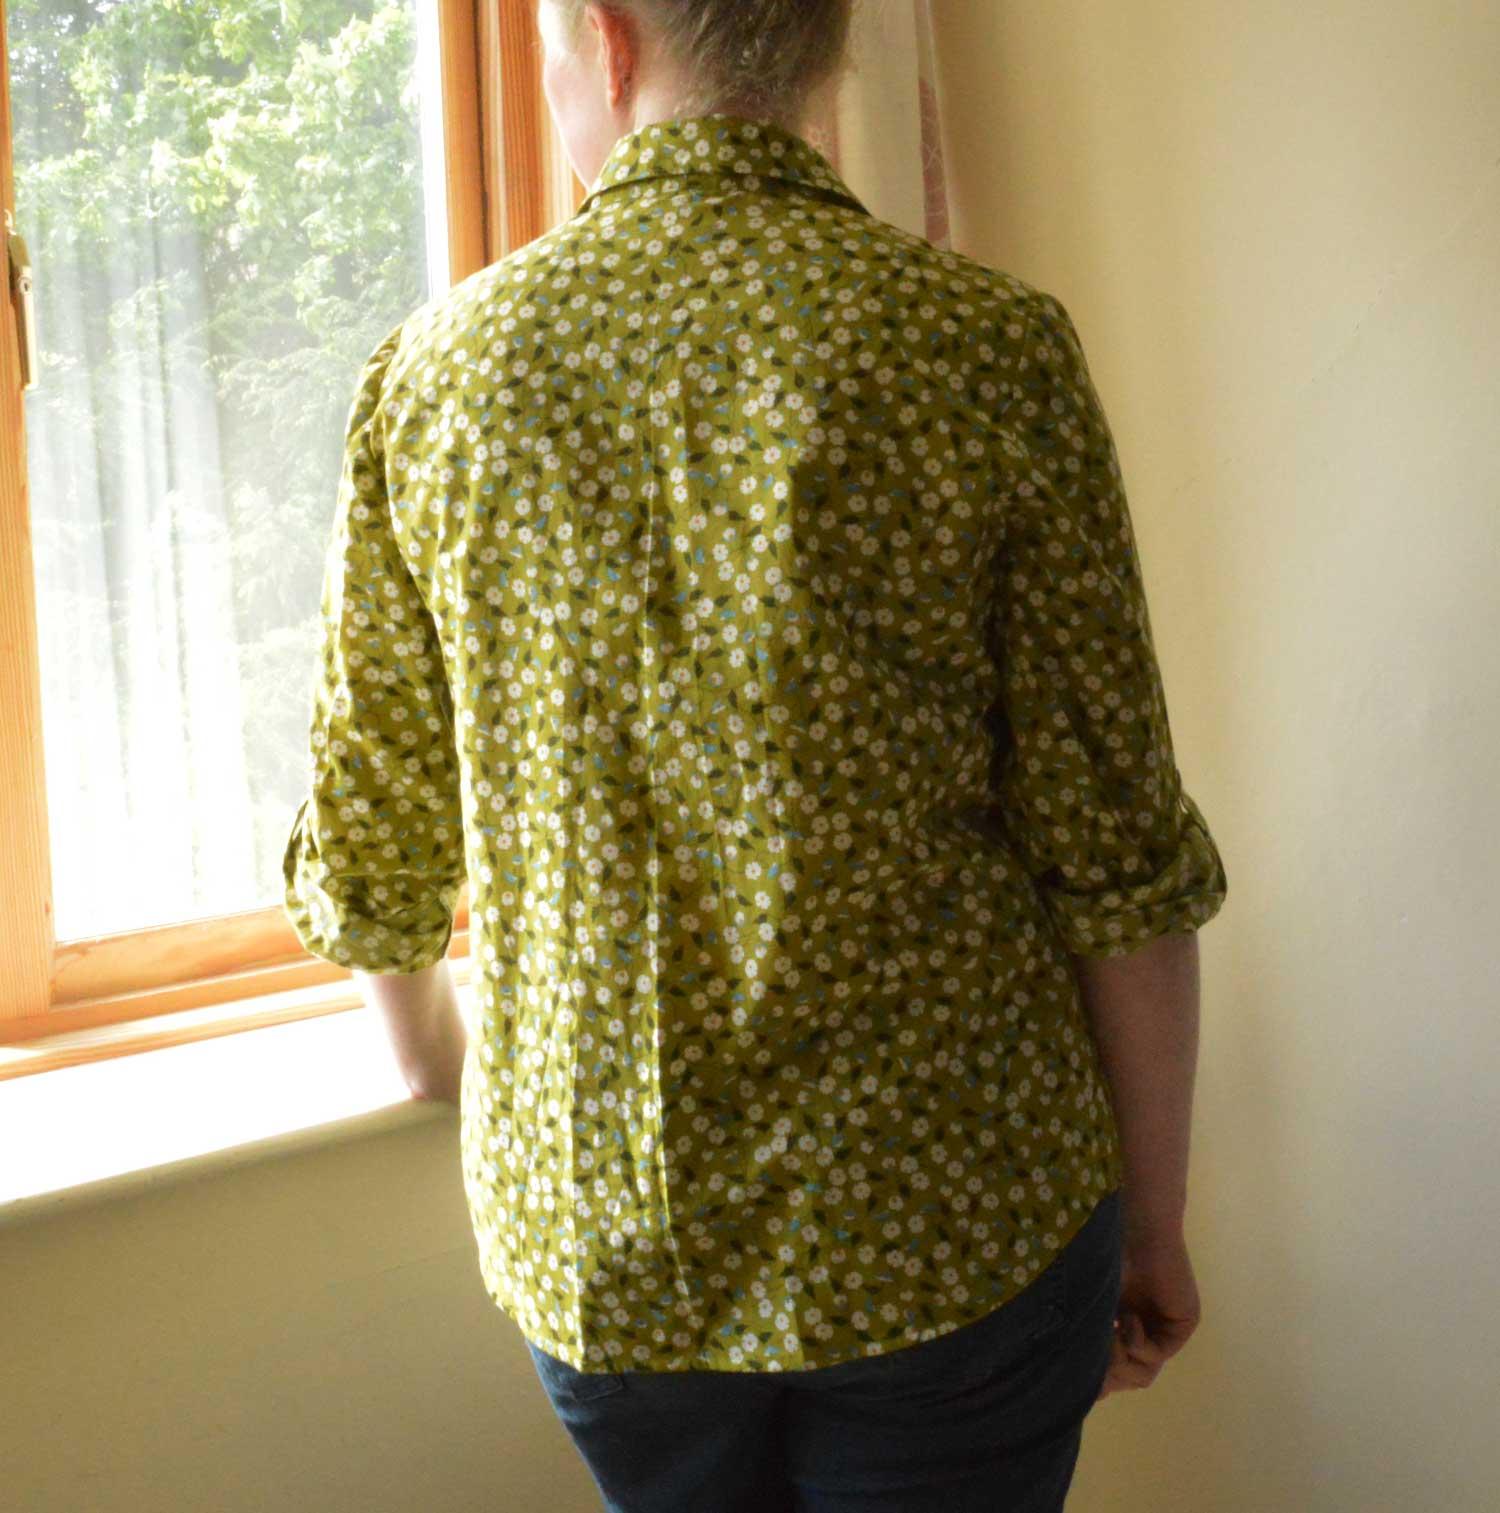 Holm Sown: Butterick B5526 Shirt // daisy pima cotton lawn - green // shirt back